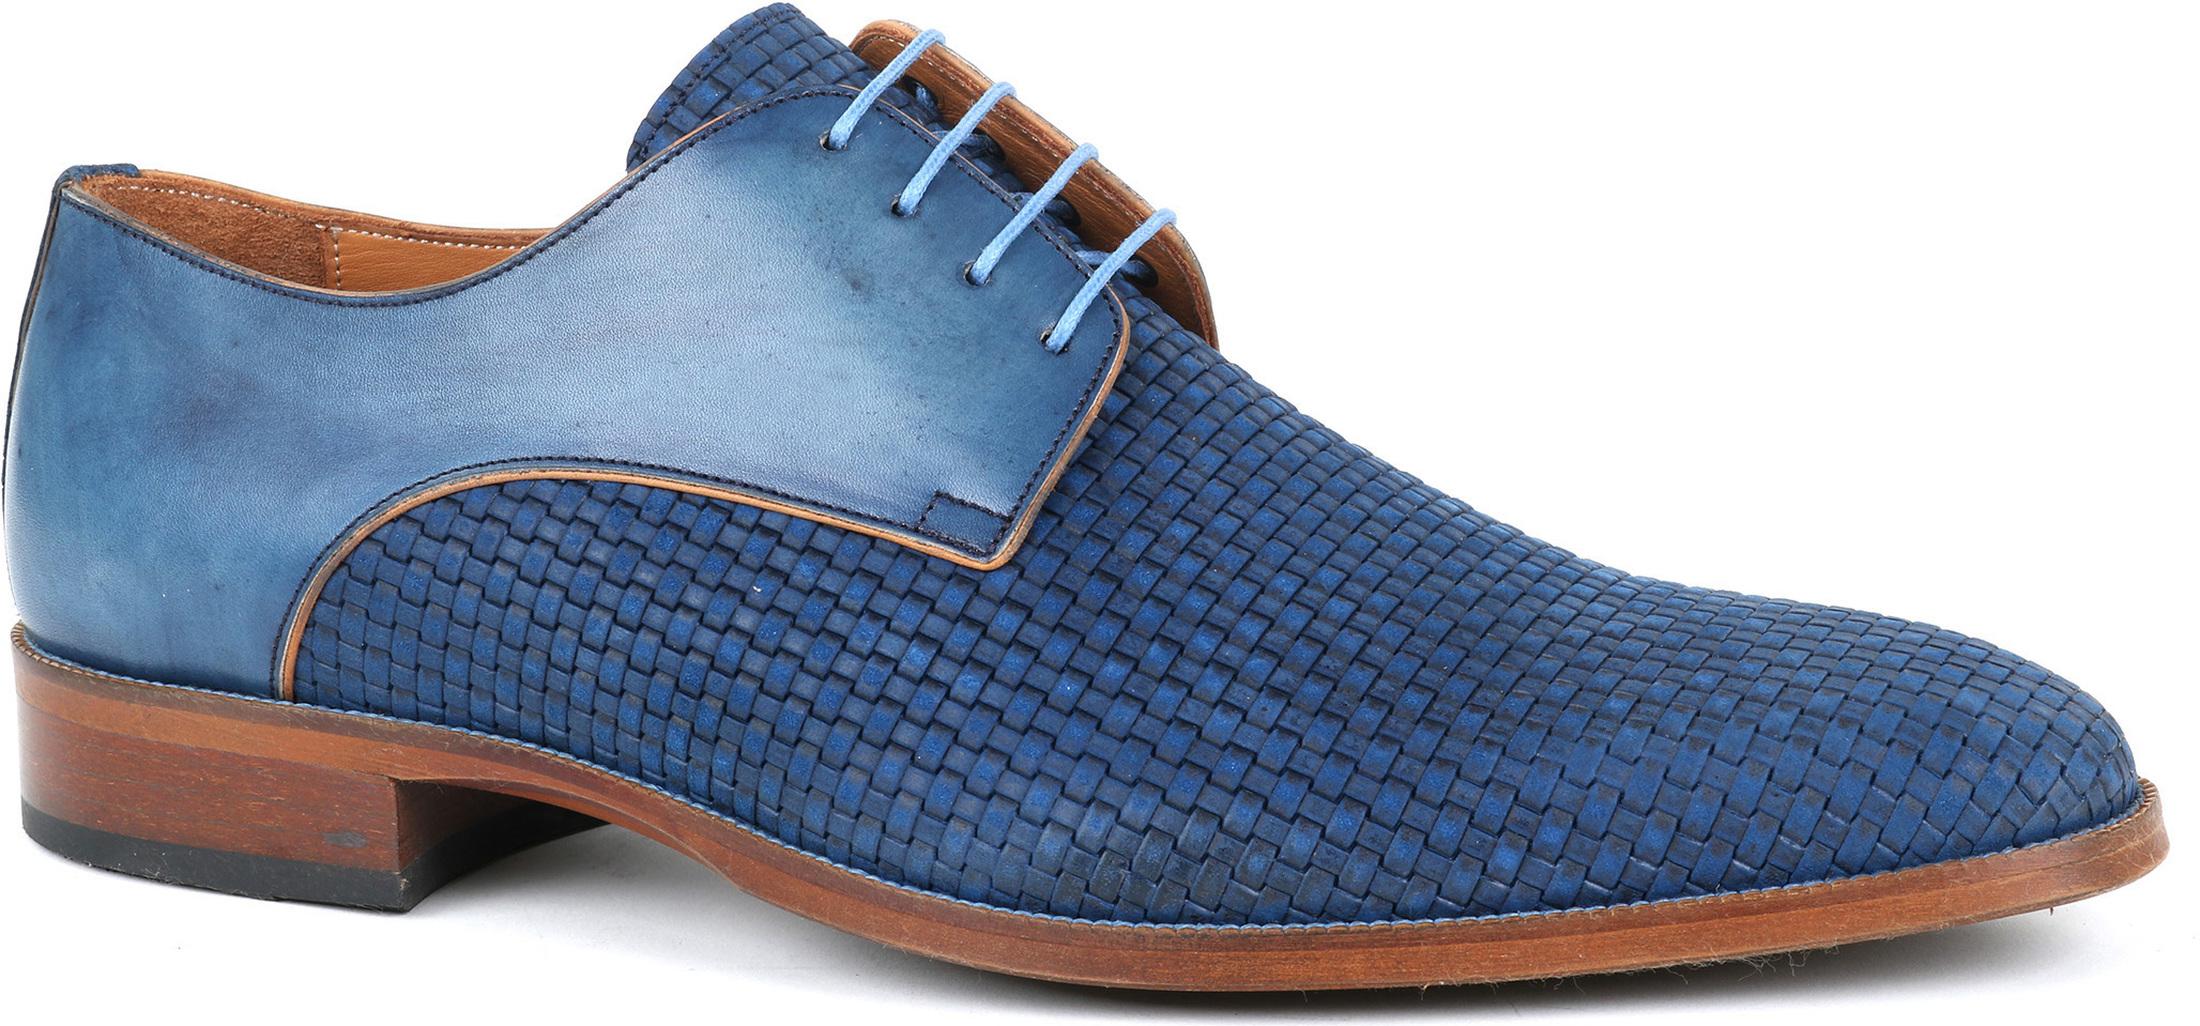 Leder Schuh Zopf Blau foto 0